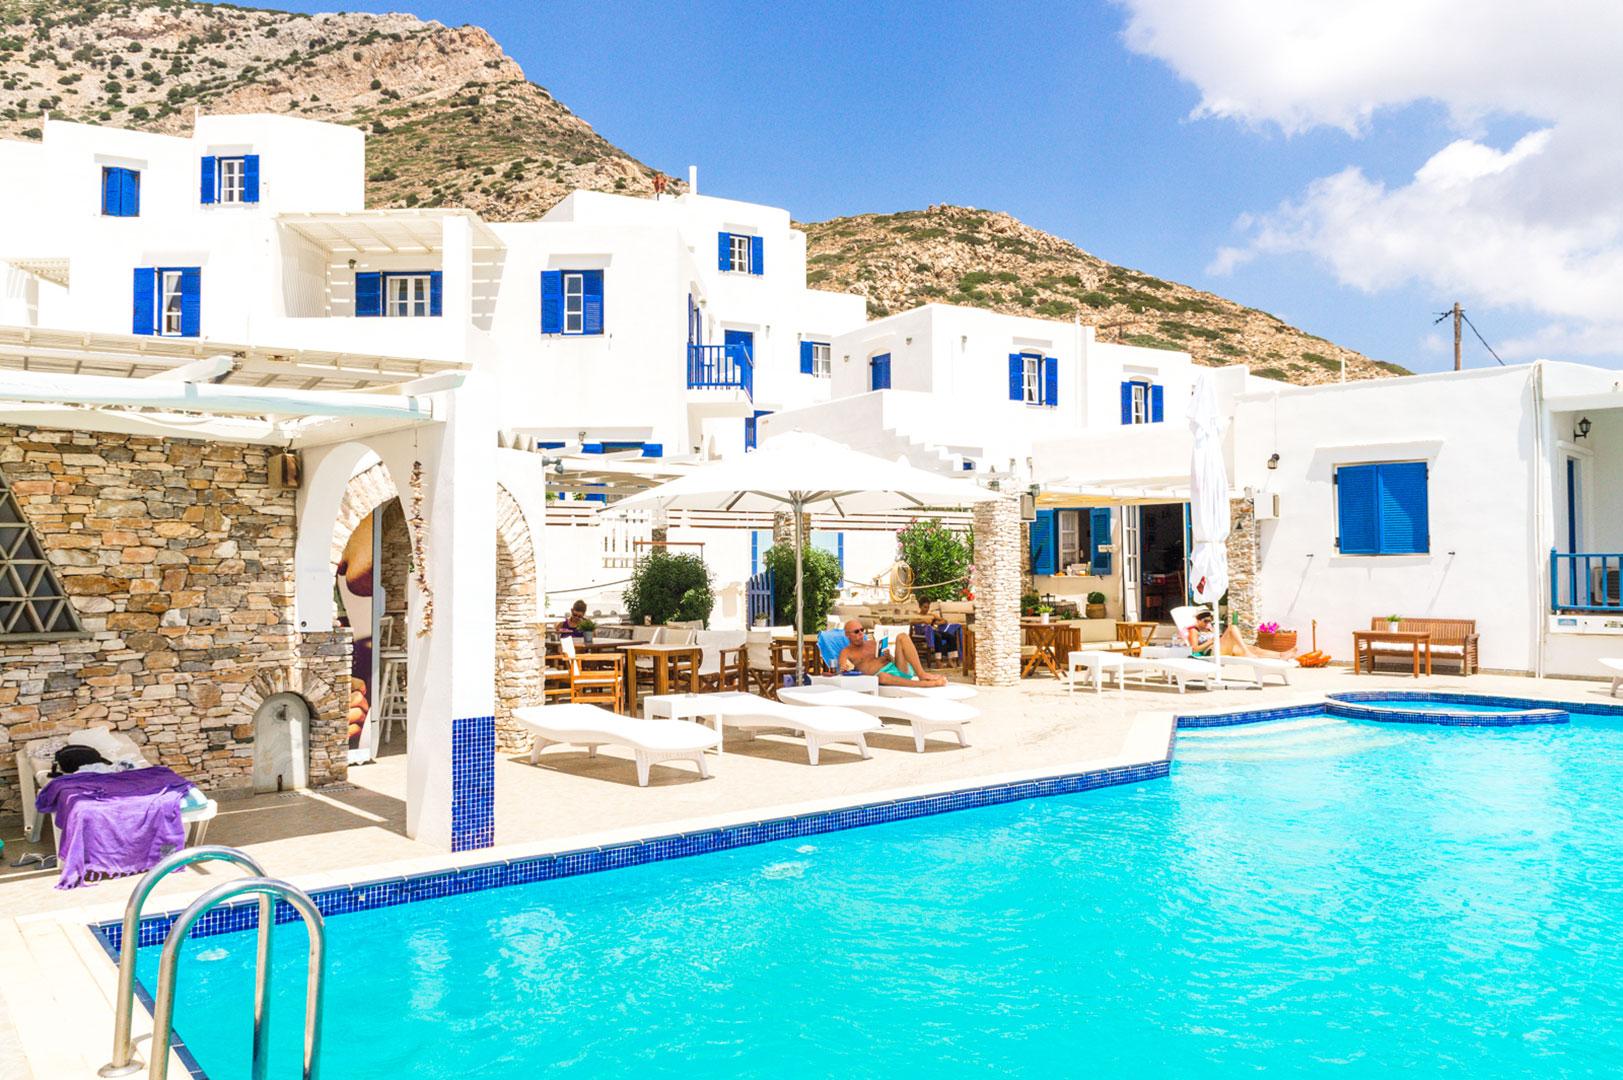 sifnos-greece-la-vie-en-blog-all-rights-reserved-45